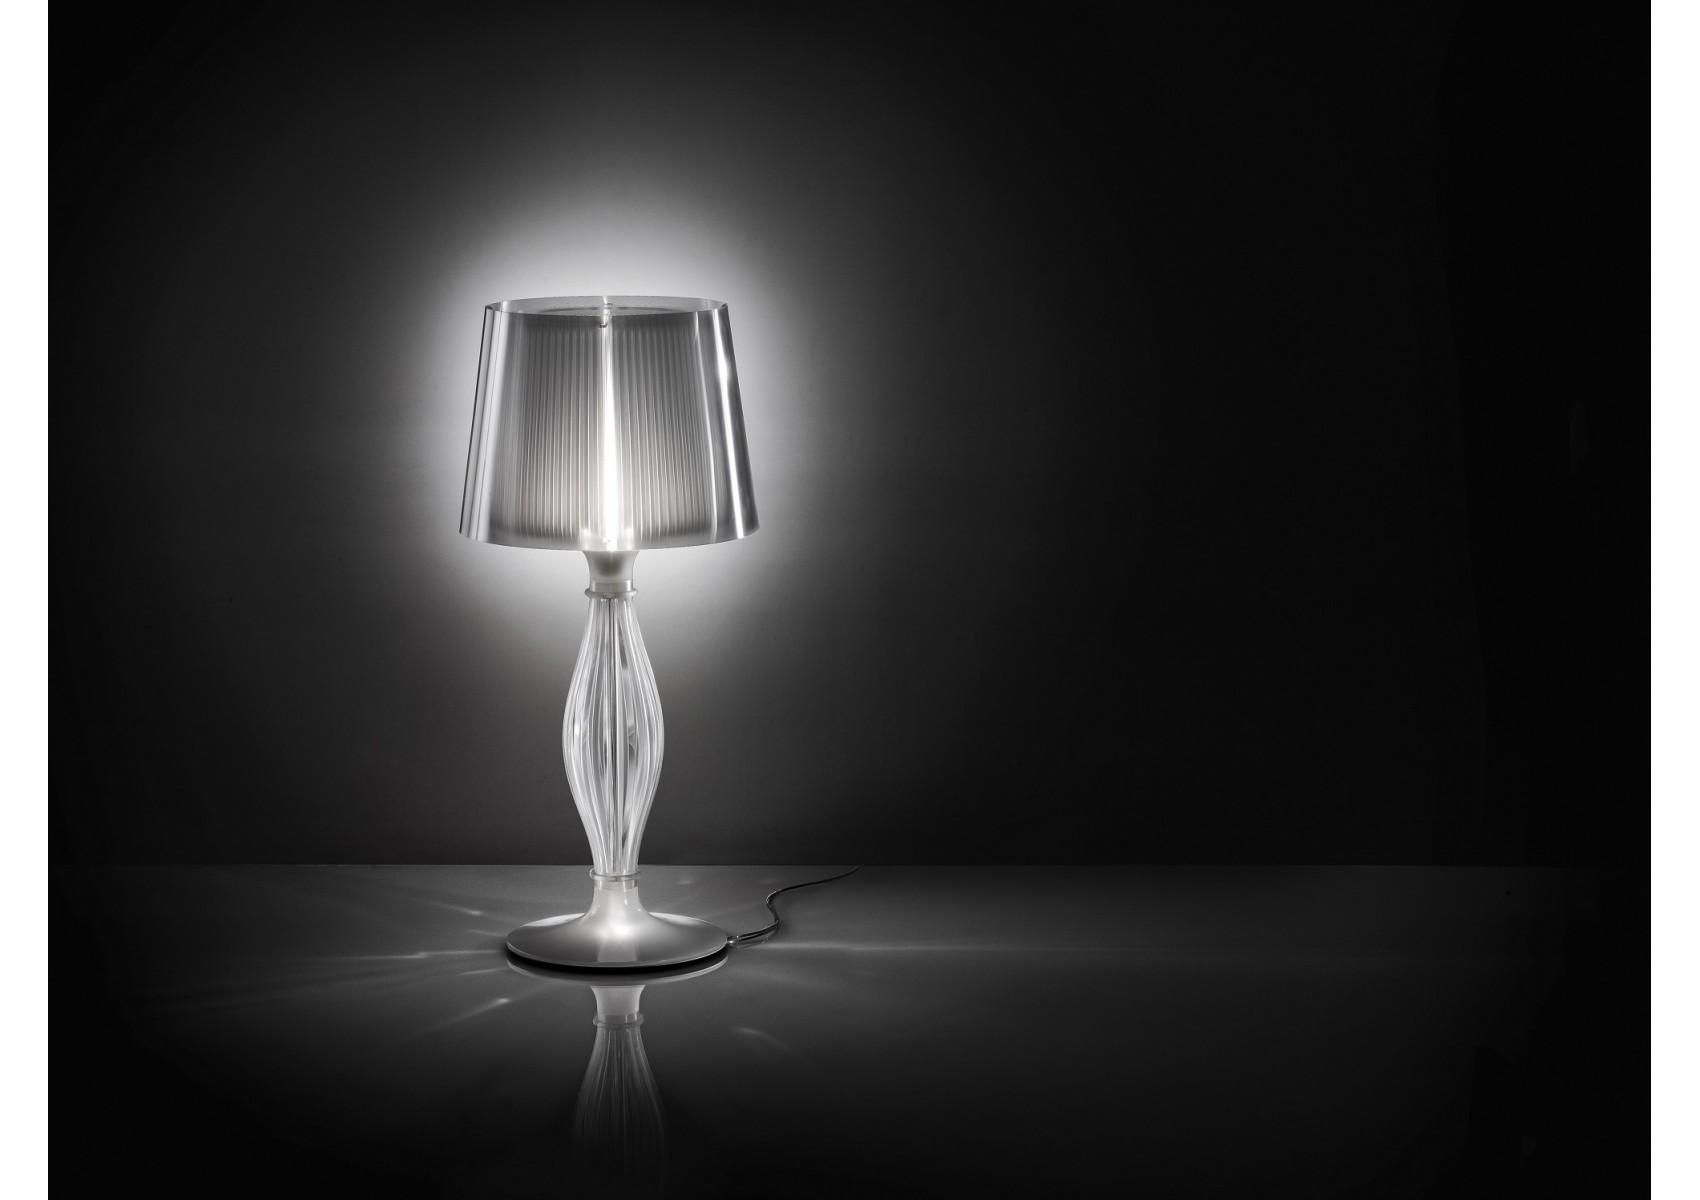 lampe de table design liza boite design. Black Bedroom Furniture Sets. Home Design Ideas